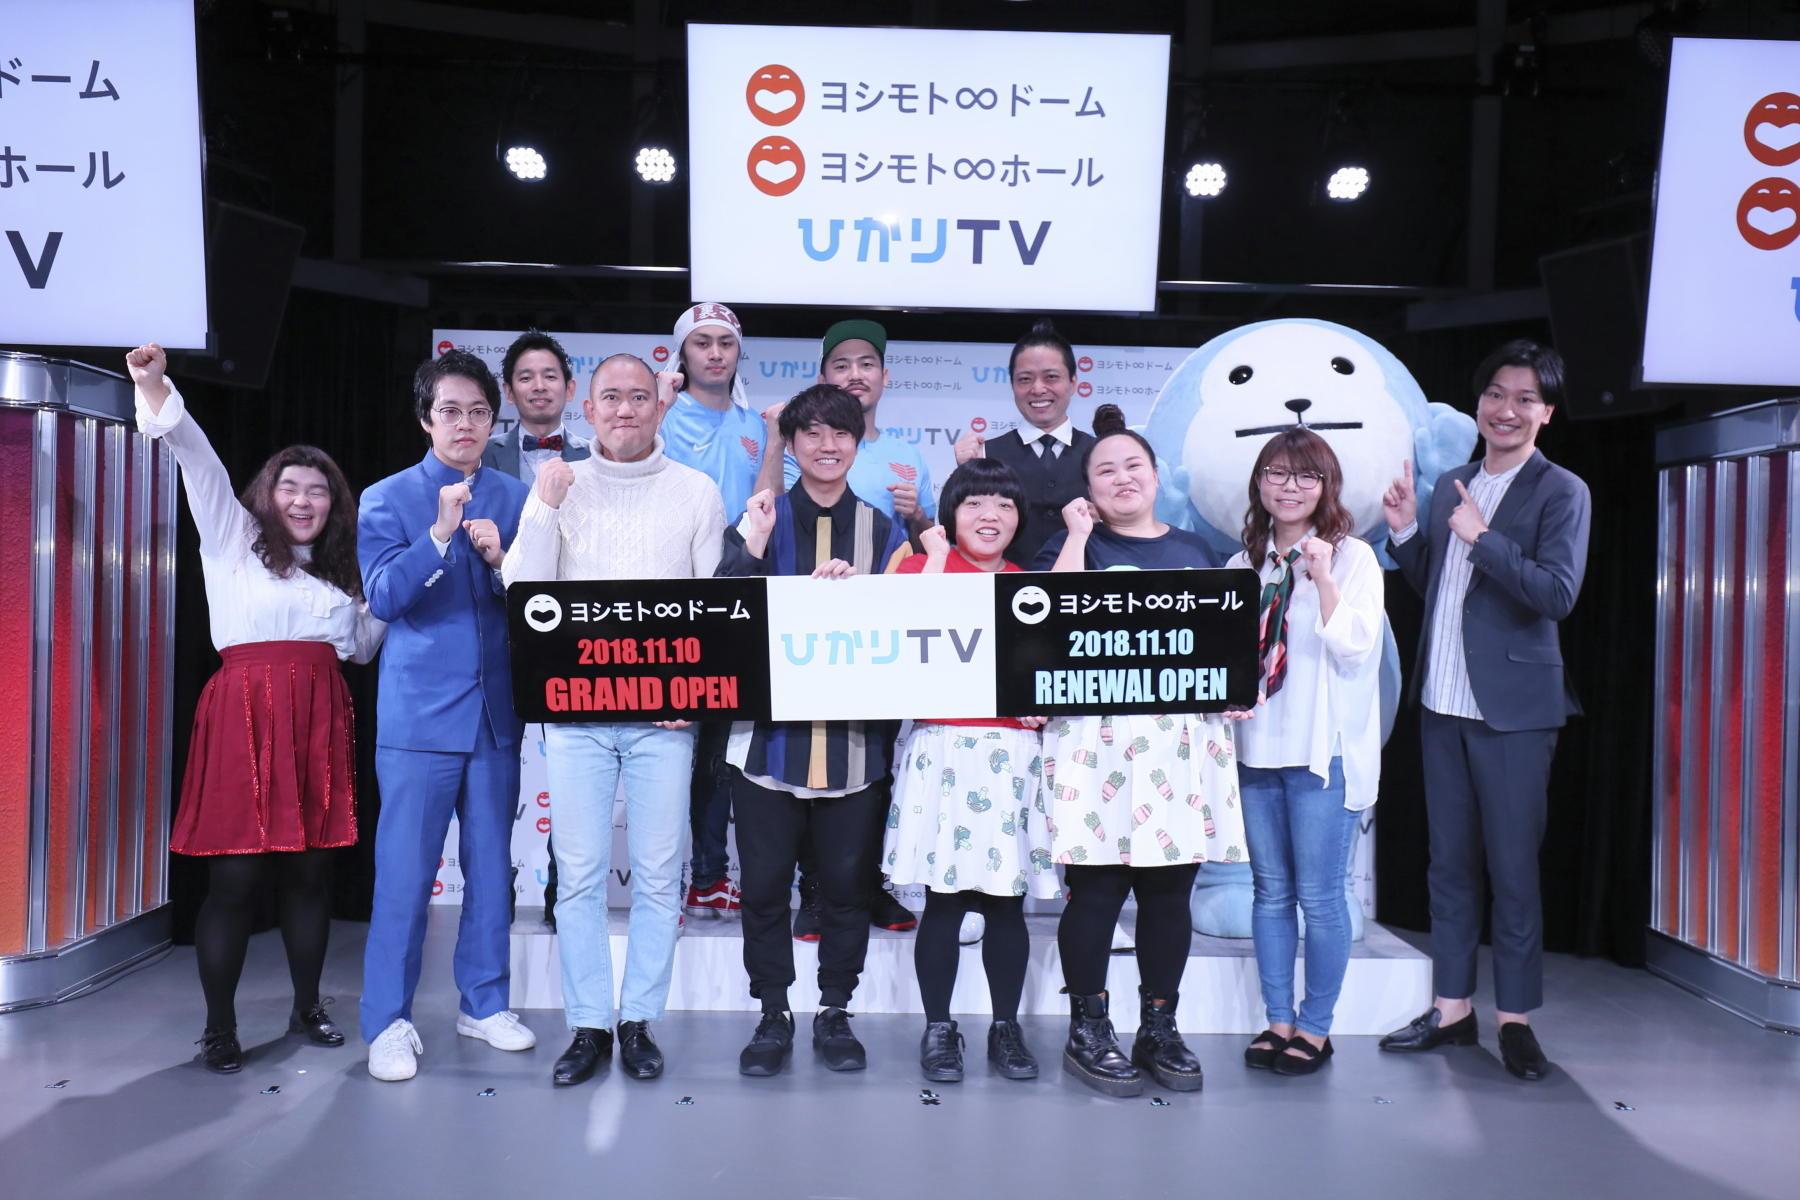 http://news.yoshimoto.co.jp/20181110145537-c2cd51a345d4fb112f70fcd07d00106f5df69a19.jpg